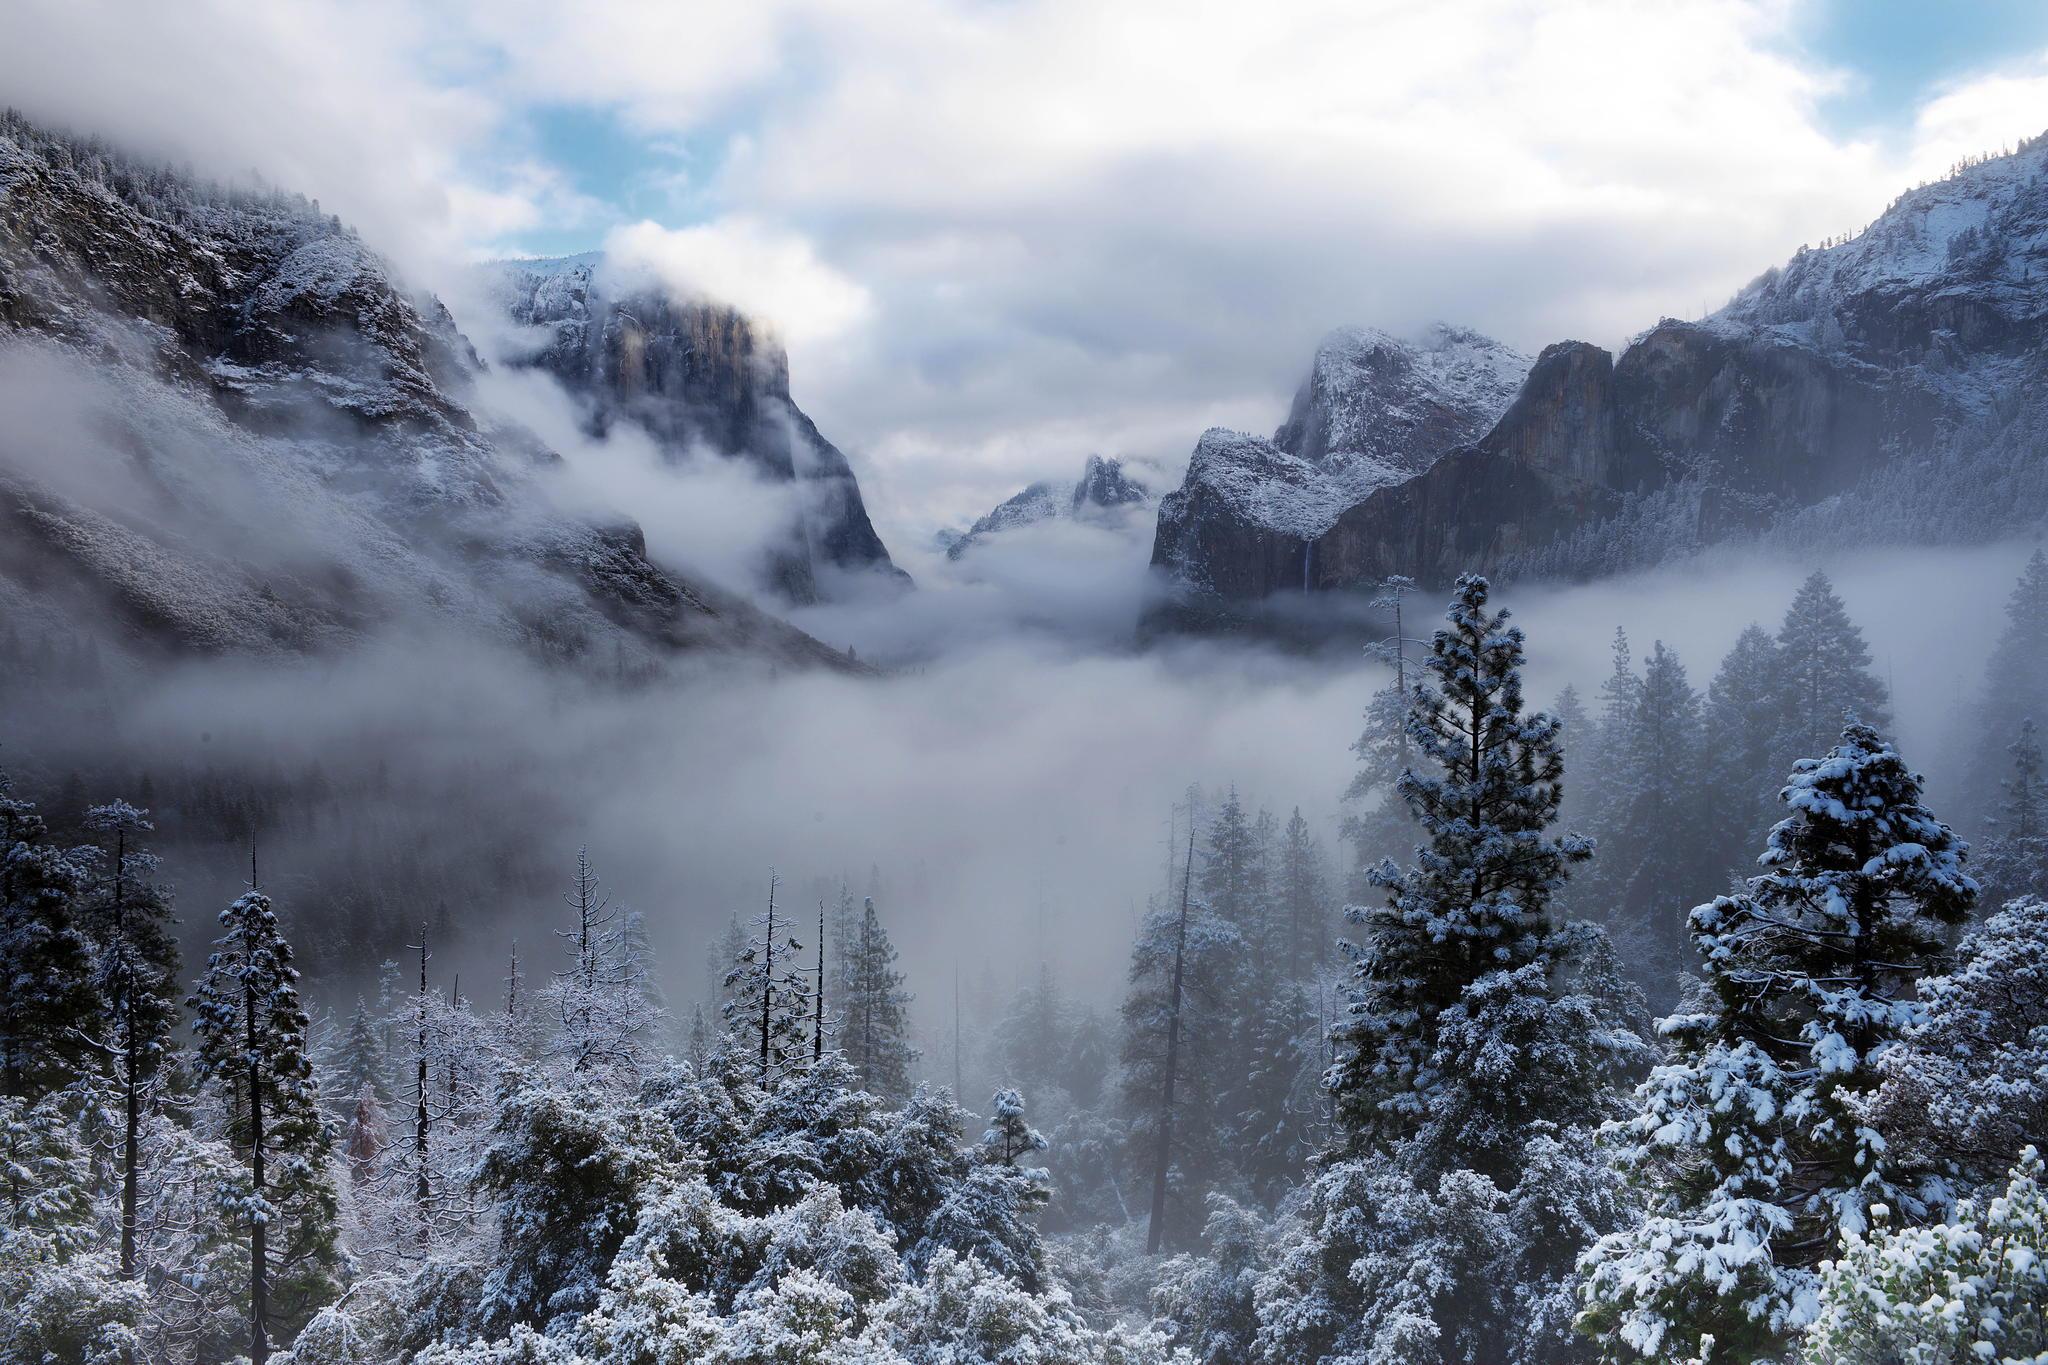 снег горы туман snow mountains fog  № 1146663 загрузить